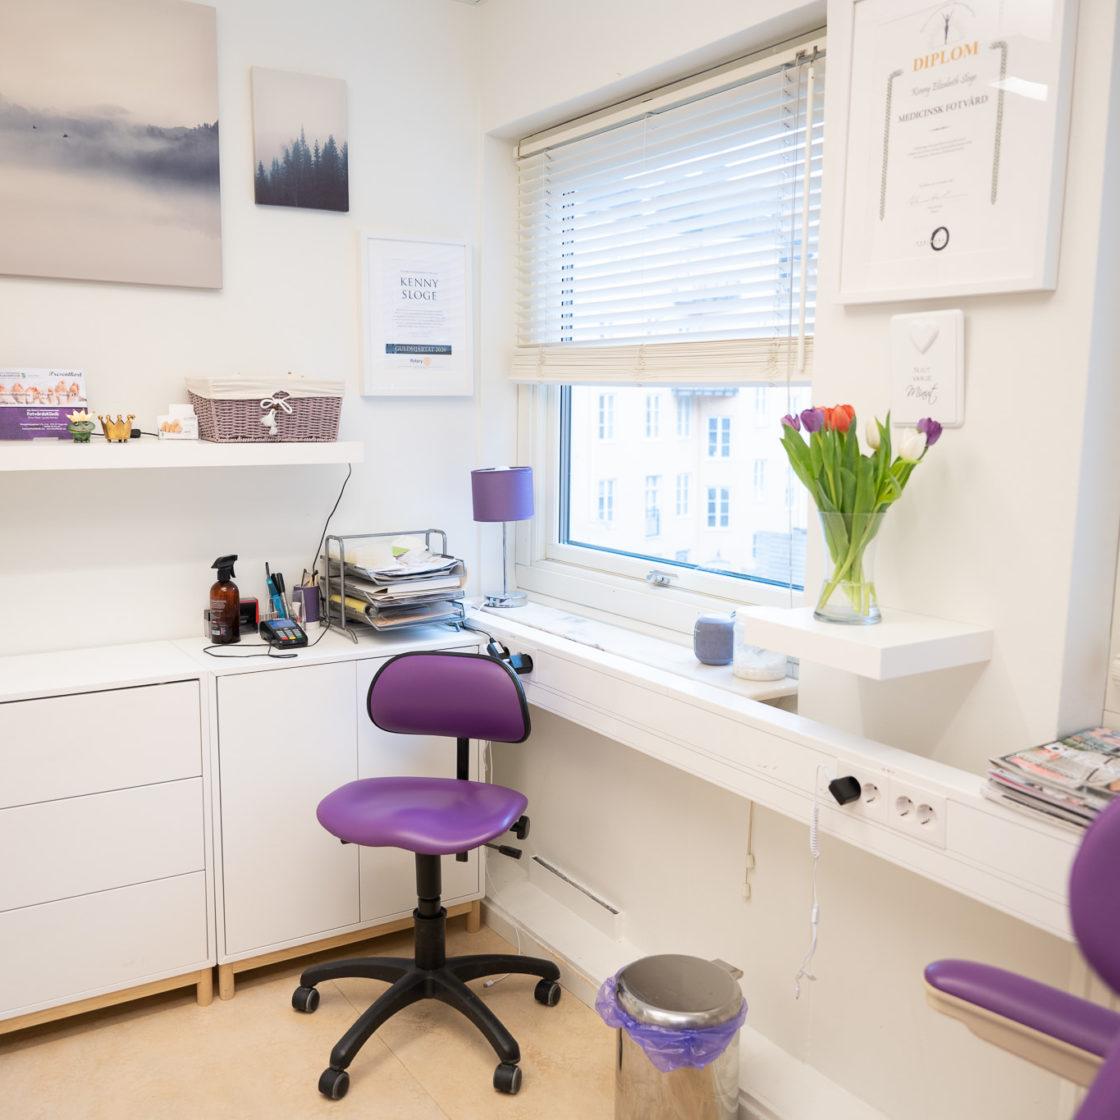 Behandlingsrummet